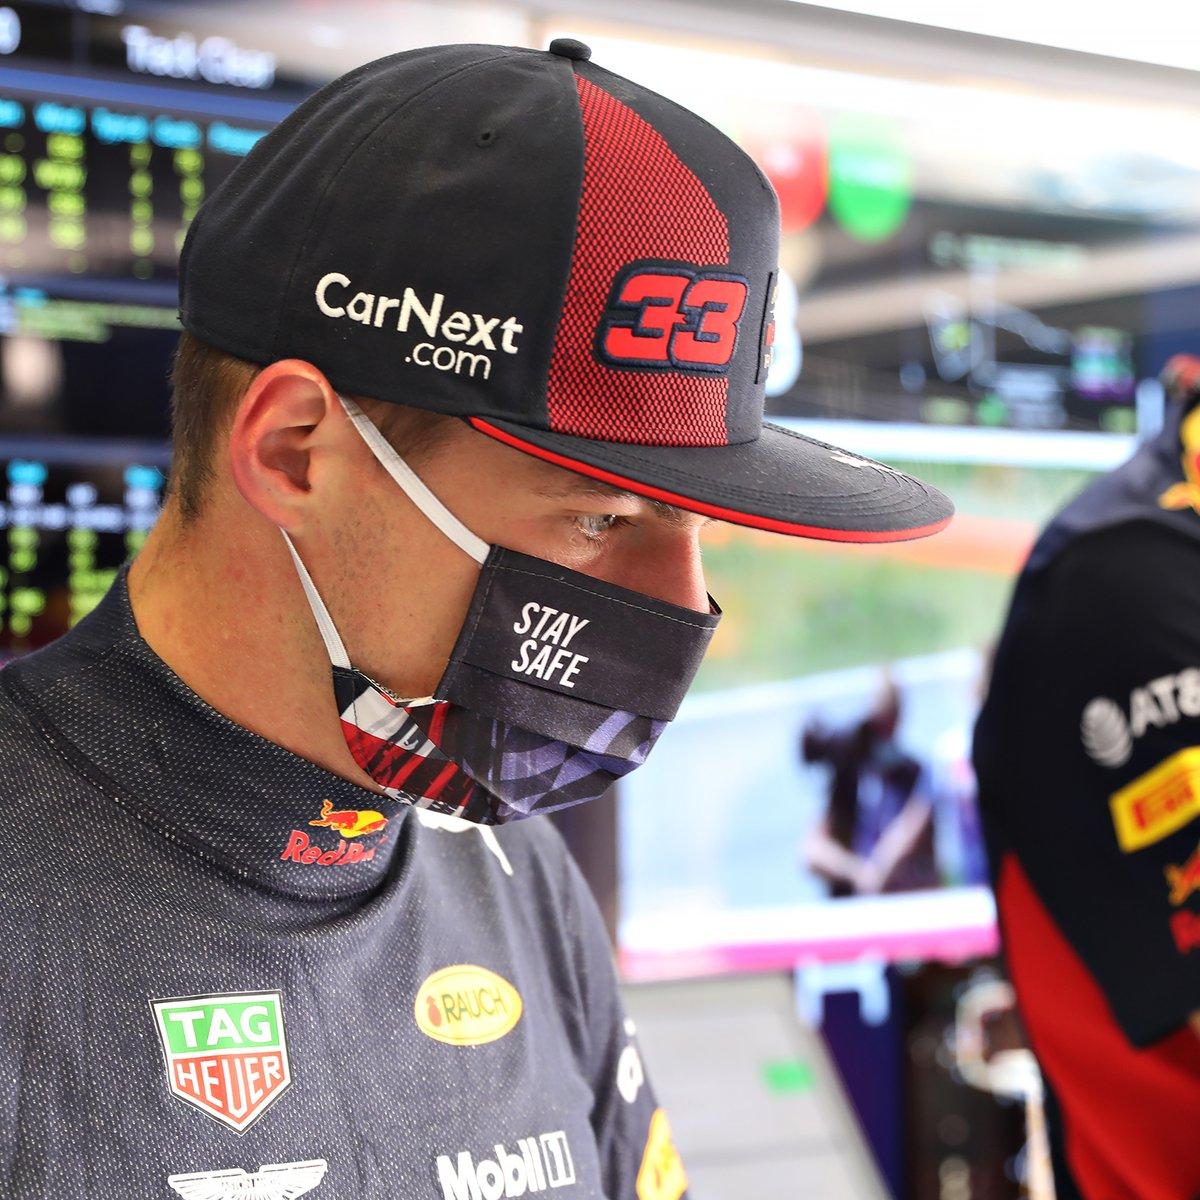 Next Grand Prix, same track, new chances 🦁 #UnleashTheLion #KeepPushing 🇦🇹 #AustrianGP https://t.co/TDOkhnwTko